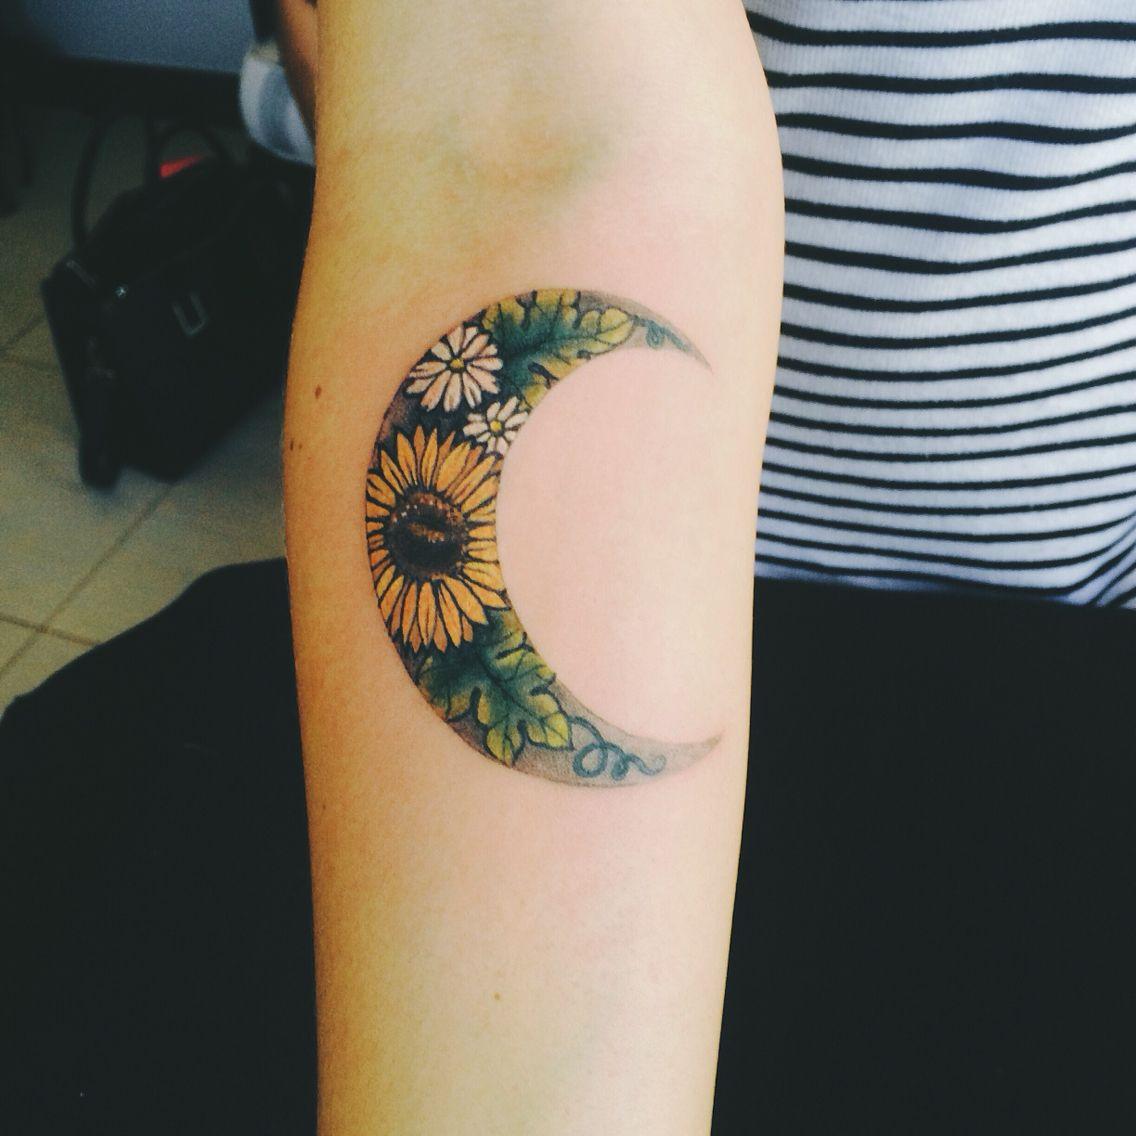 Tatuagens de girassol